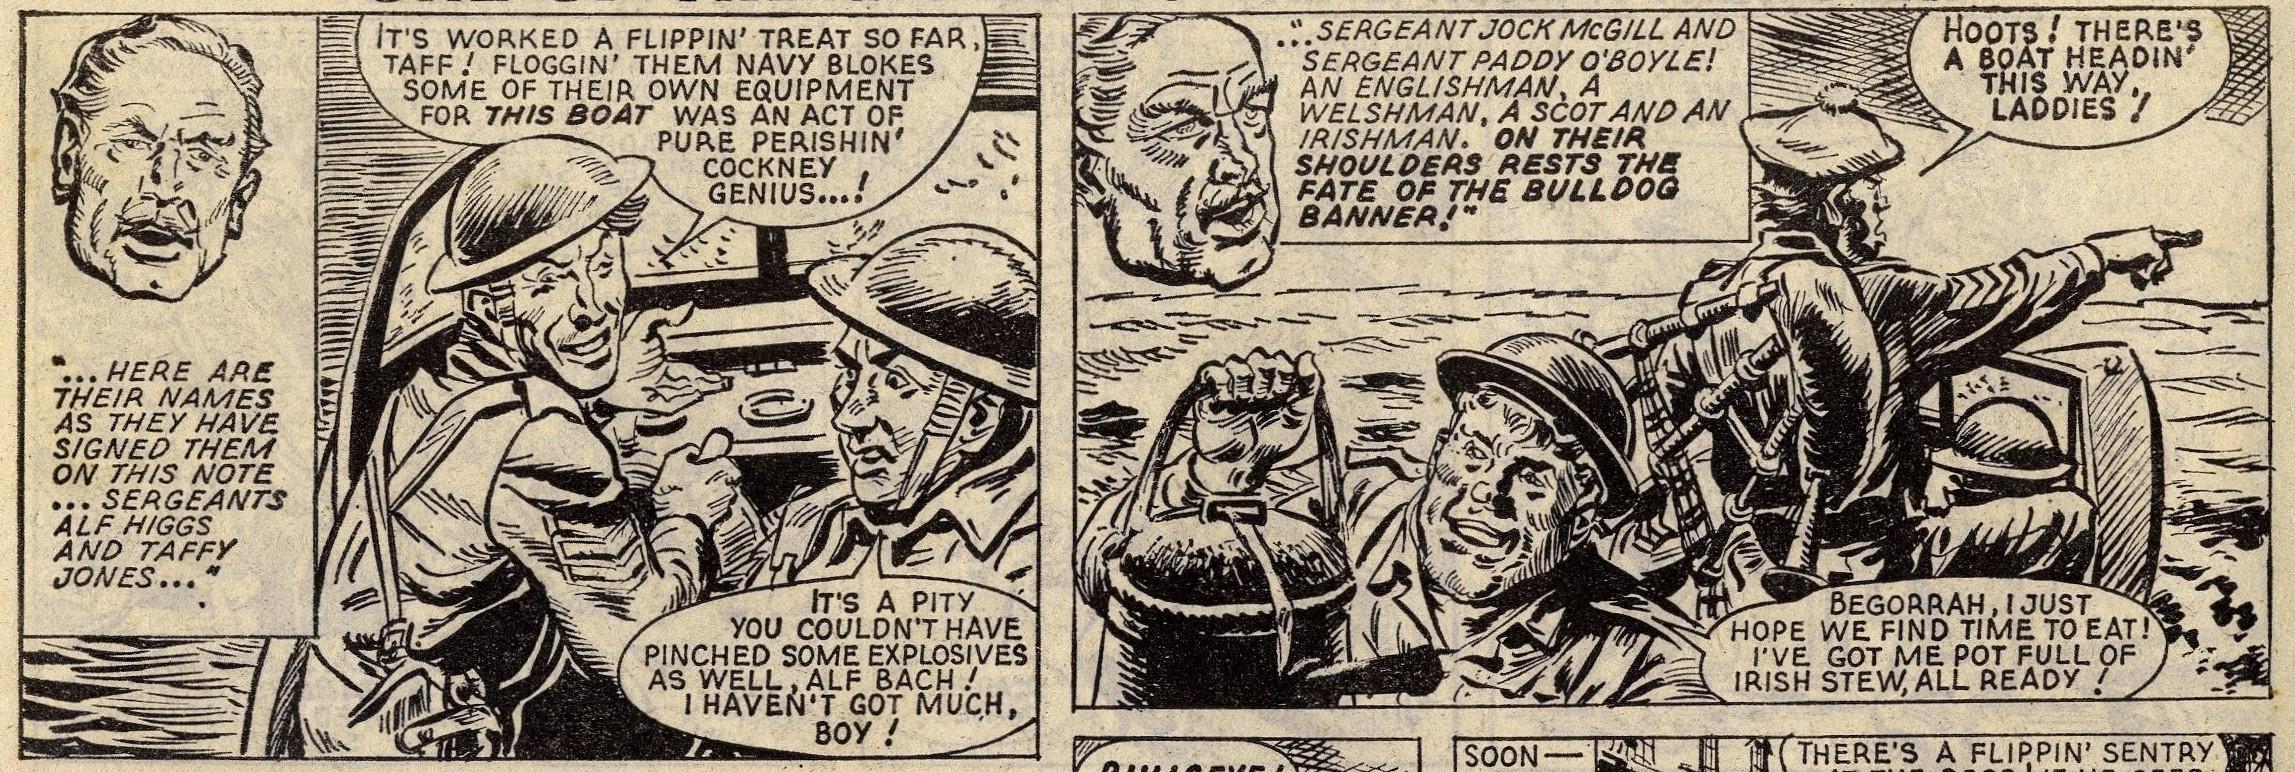 Sergeants Four: Fed Holmes (artist)